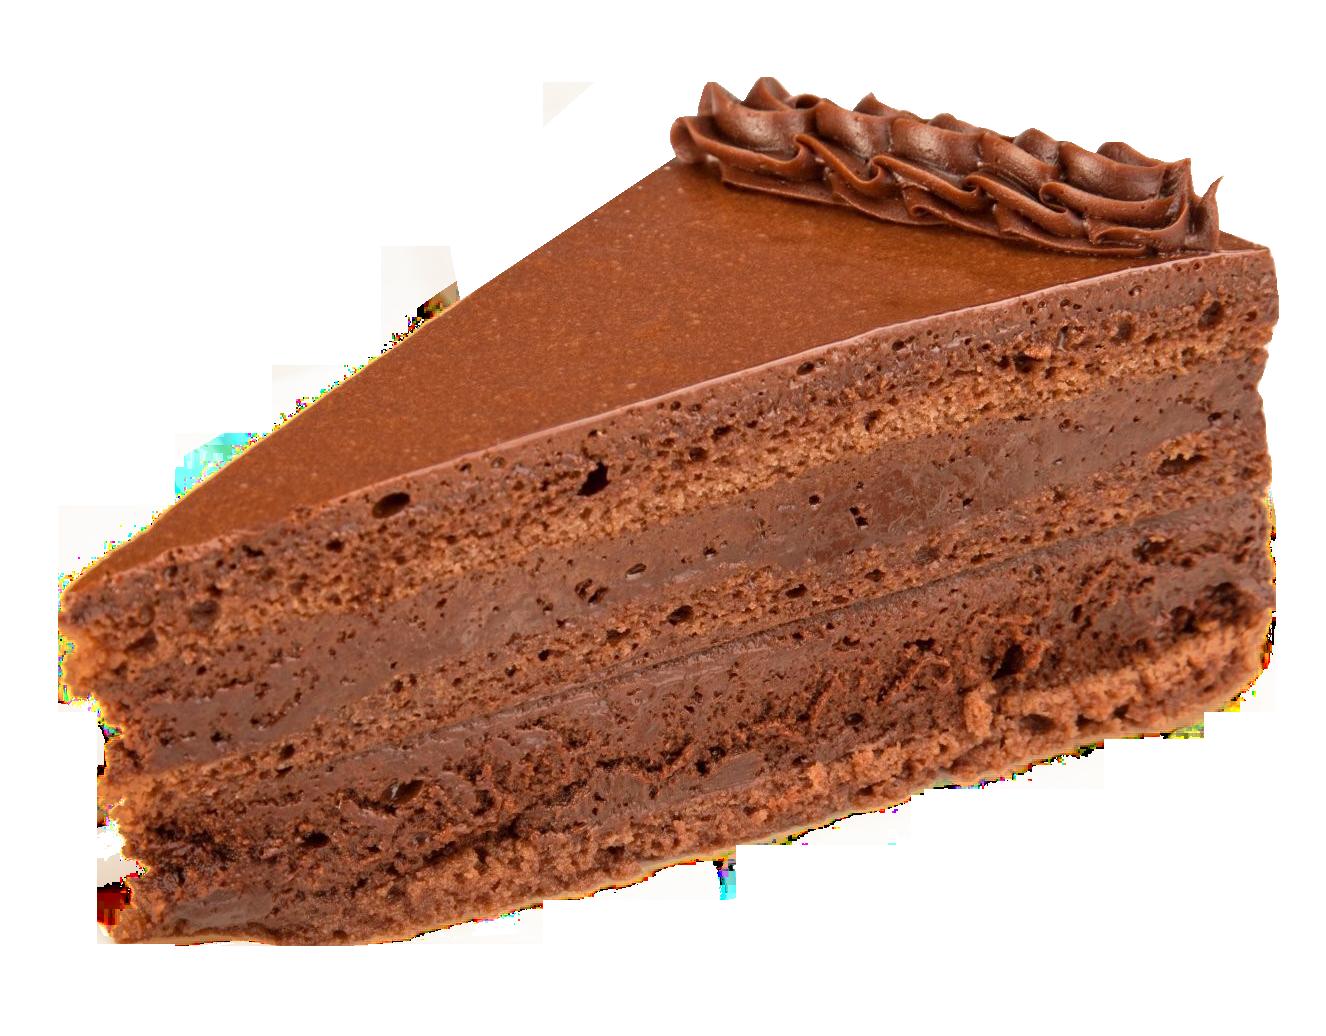 PNG Slice Of Cake Transparent Slice Of Cake.PNG Images..